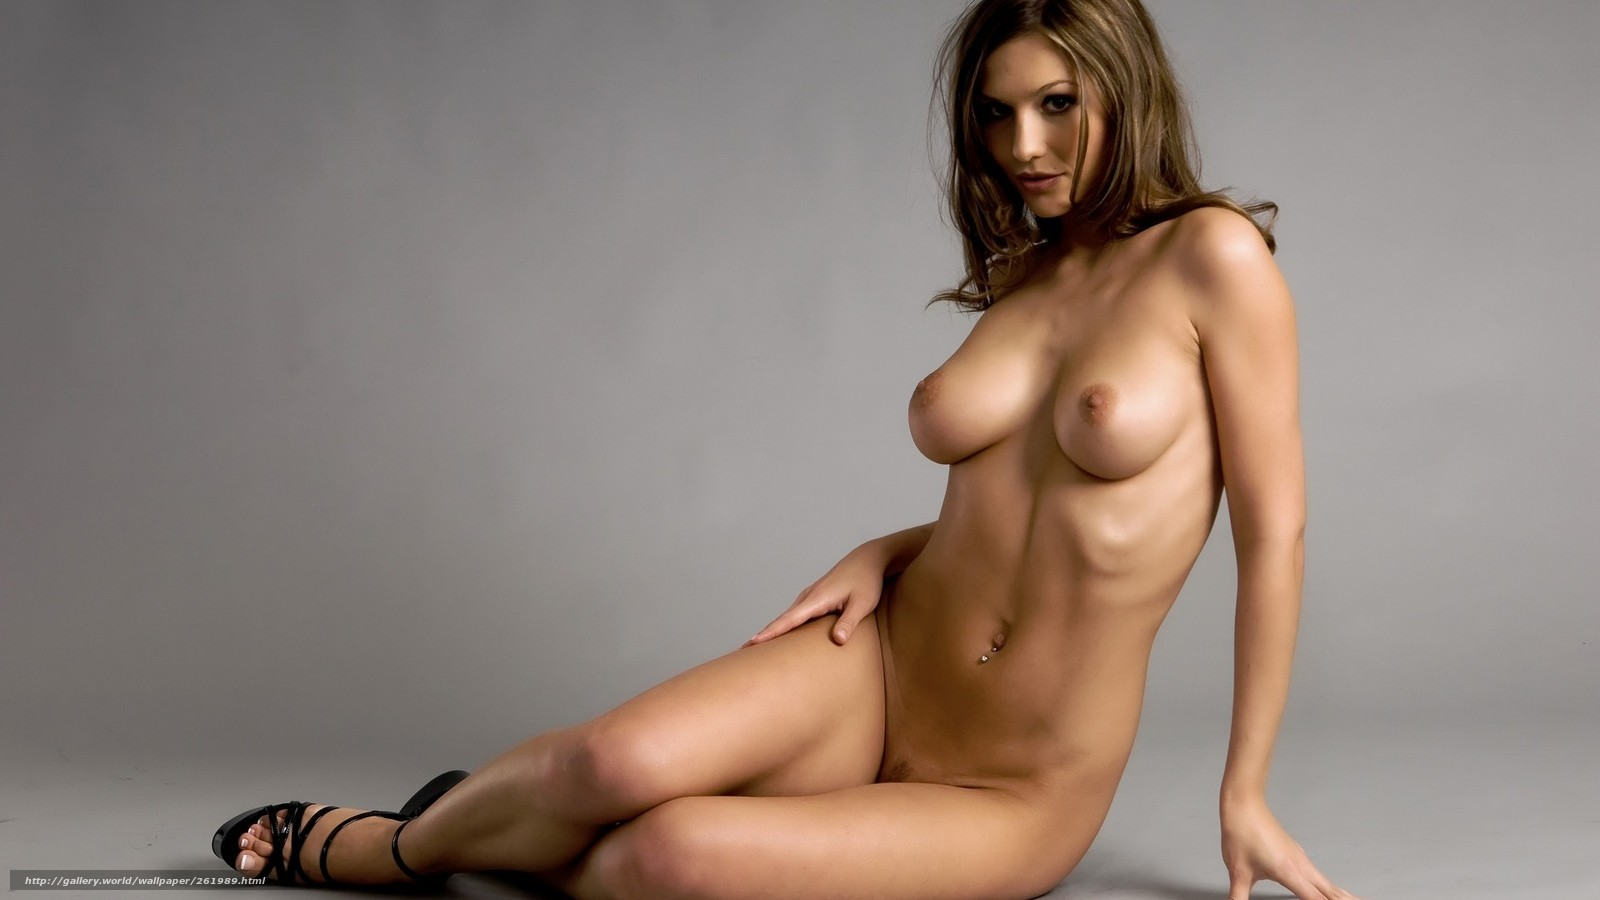 девушка голая hd фото